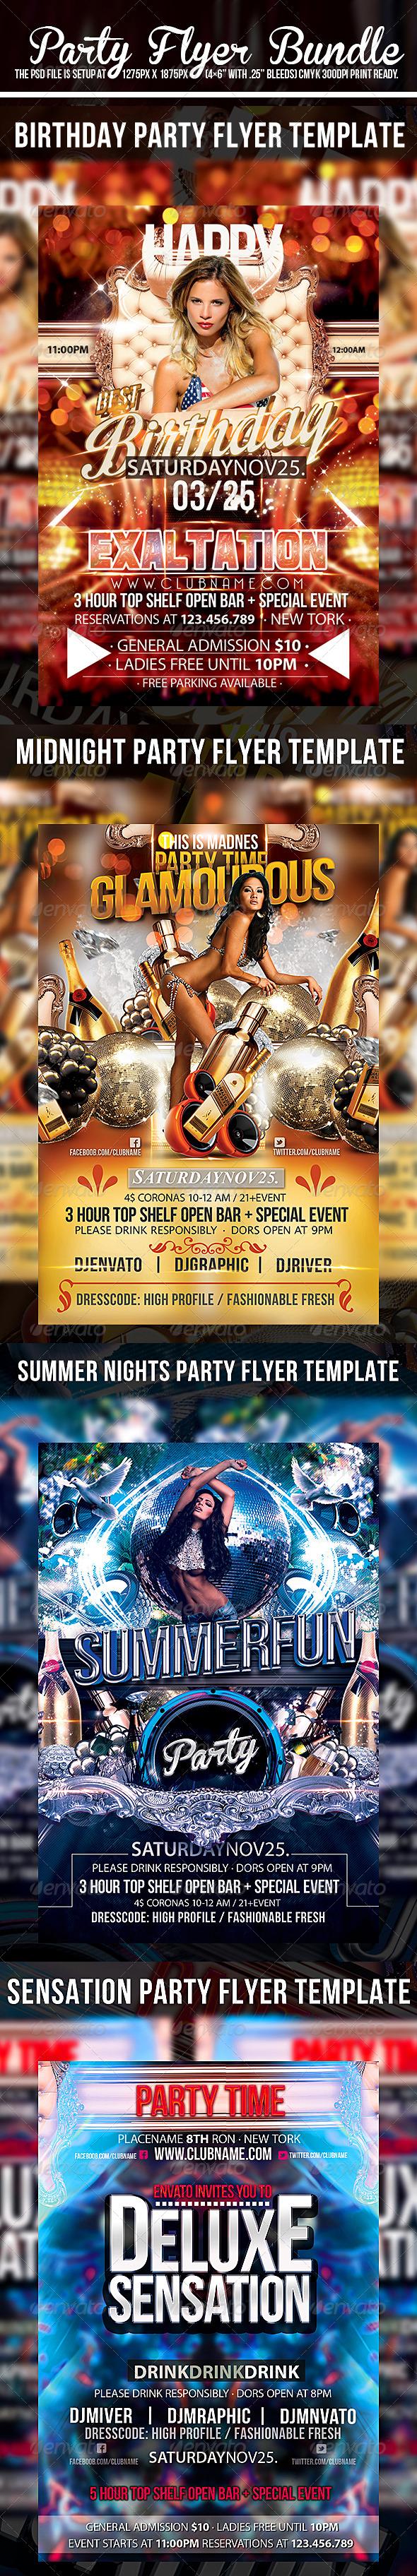 Party Flyer Bundle V2 - Events Flyers